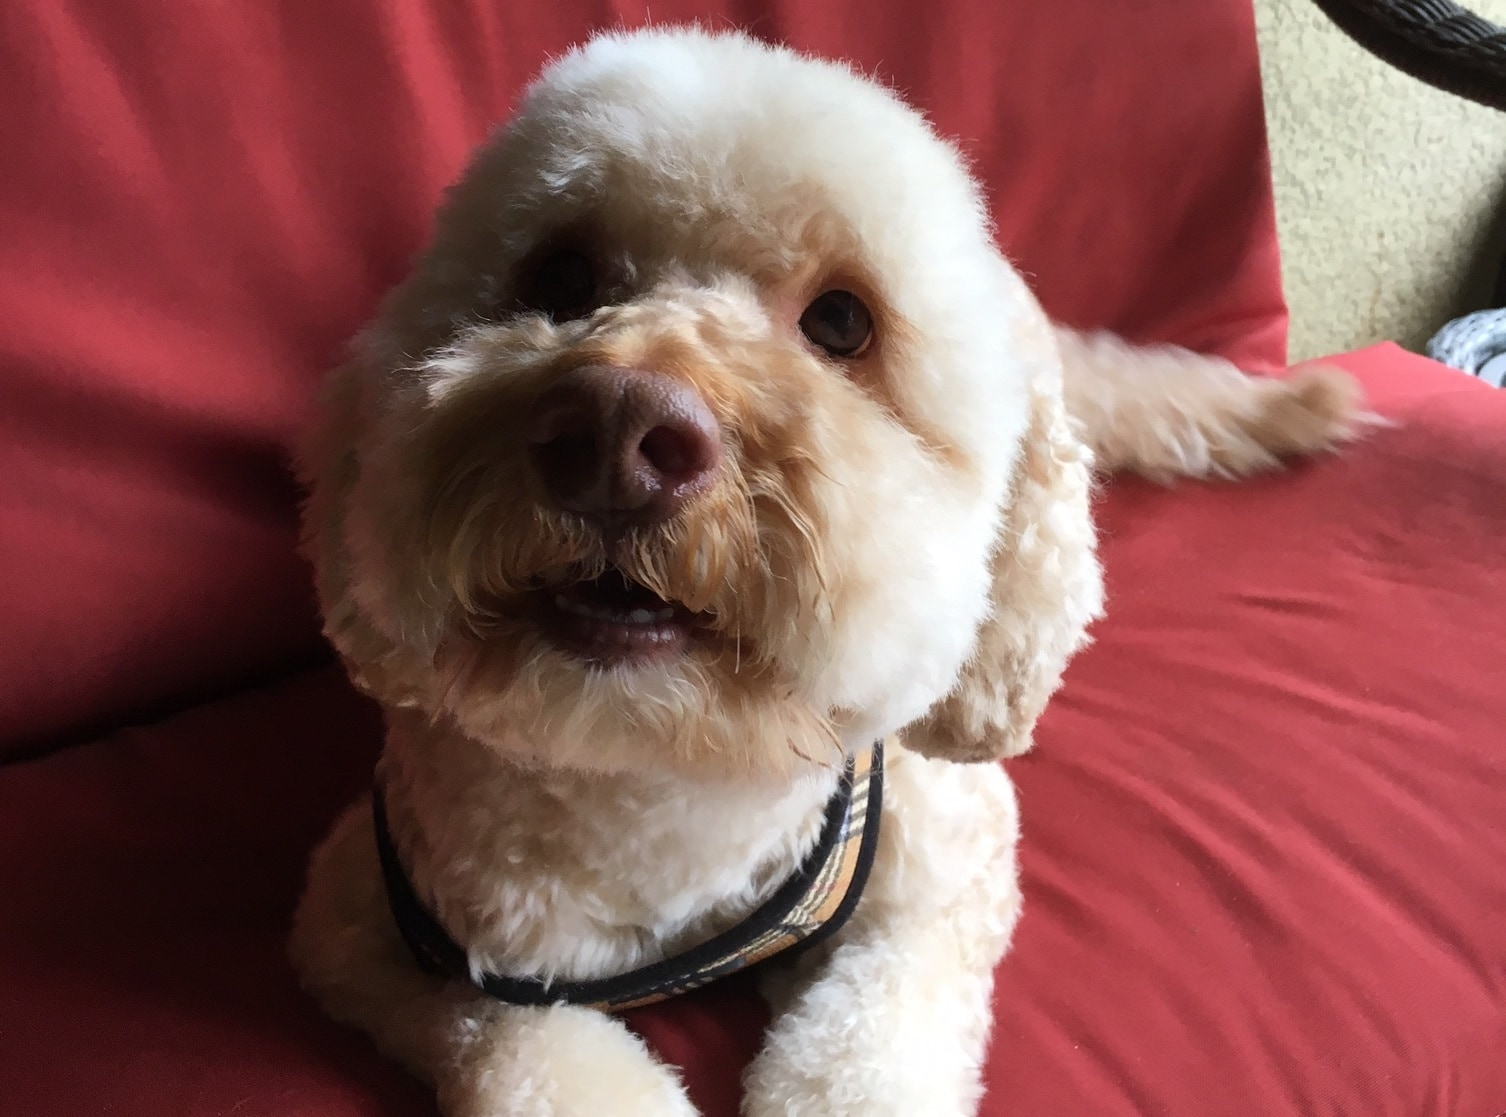 Pet Rescue & Adoption near Central FL